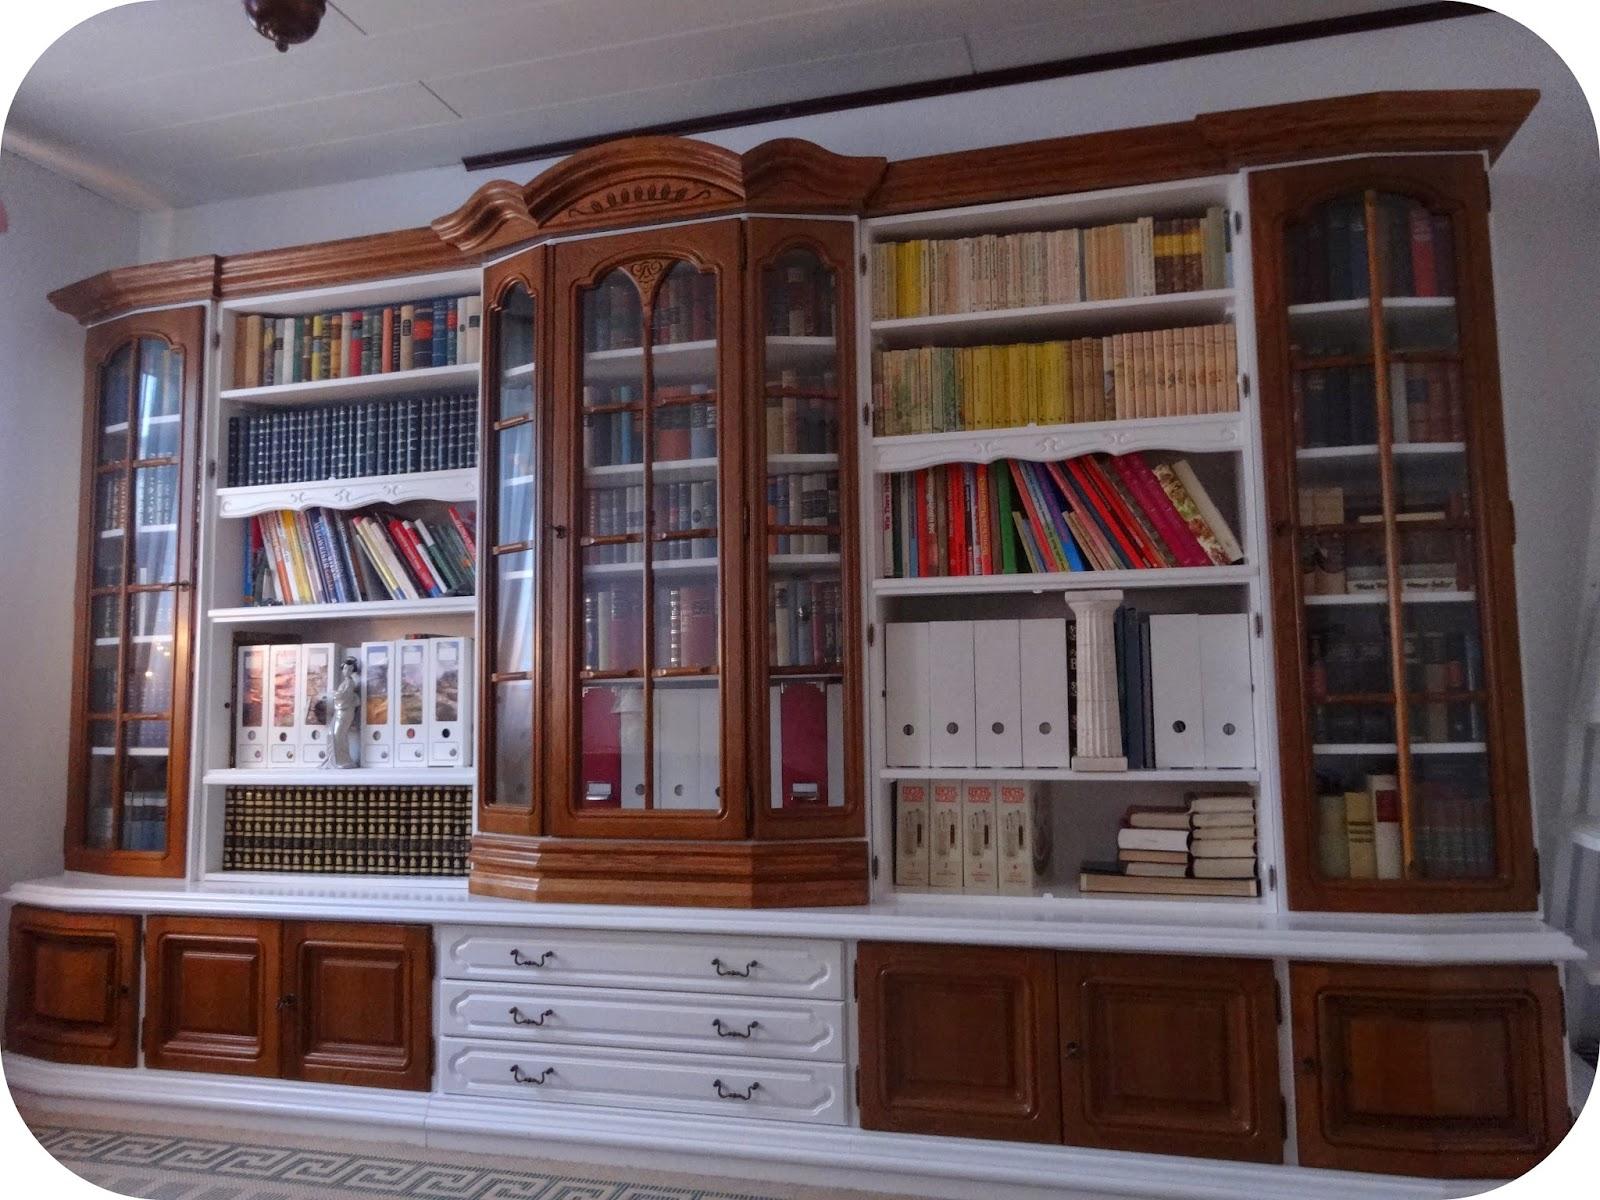 schrank neu streichen affordable holzschrank garten beautiful lamis full hd wallpaper images. Black Bedroom Furniture Sets. Home Design Ideas